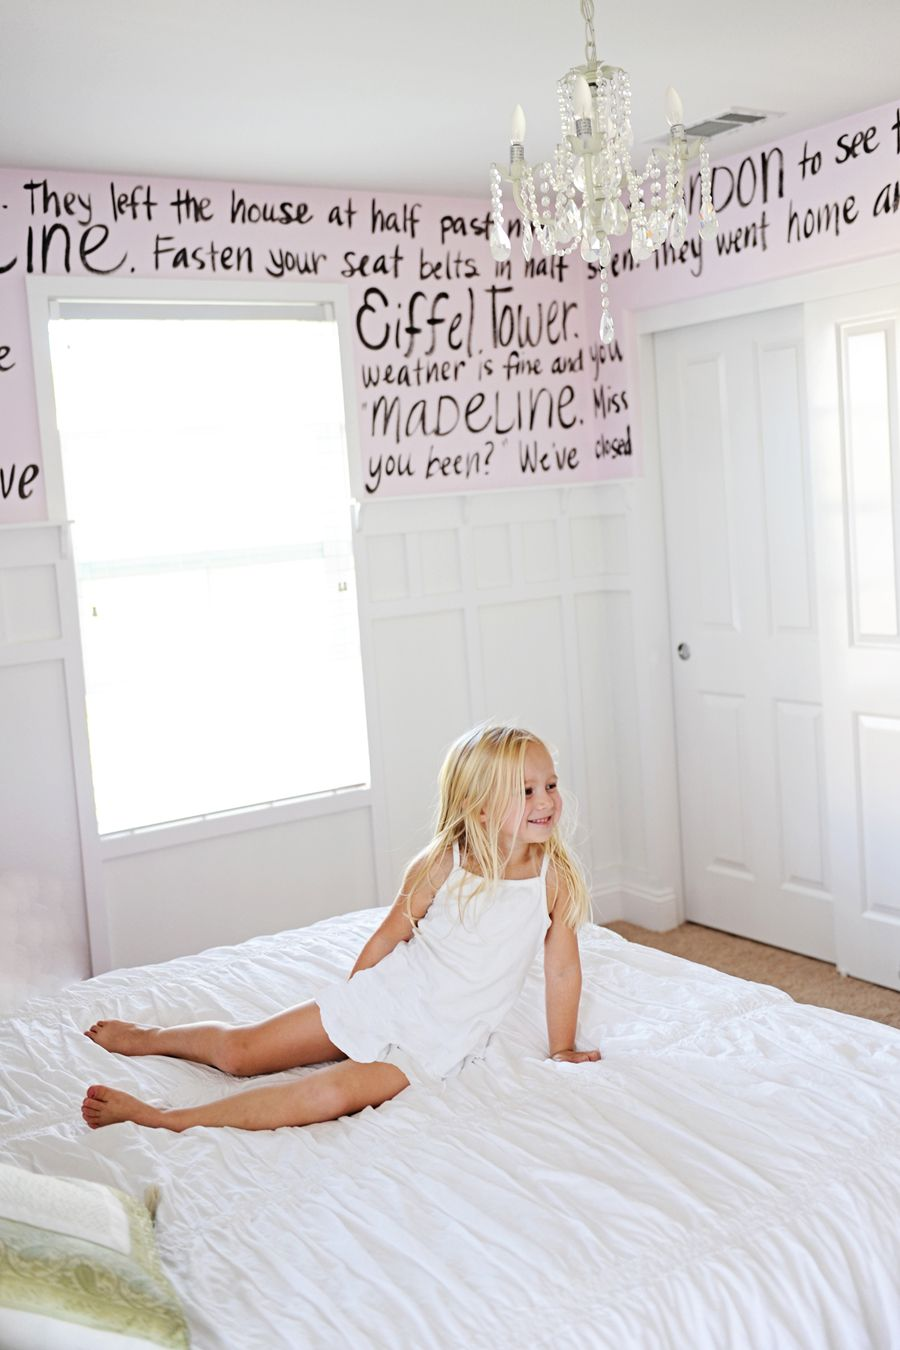 Interior Design Little Girls Bedroom Full Of Whimsy Do It Yourself Entertain Fun Diy Party Craft Ide Childrens Room Decor Little Girl Bedroom Tween Room